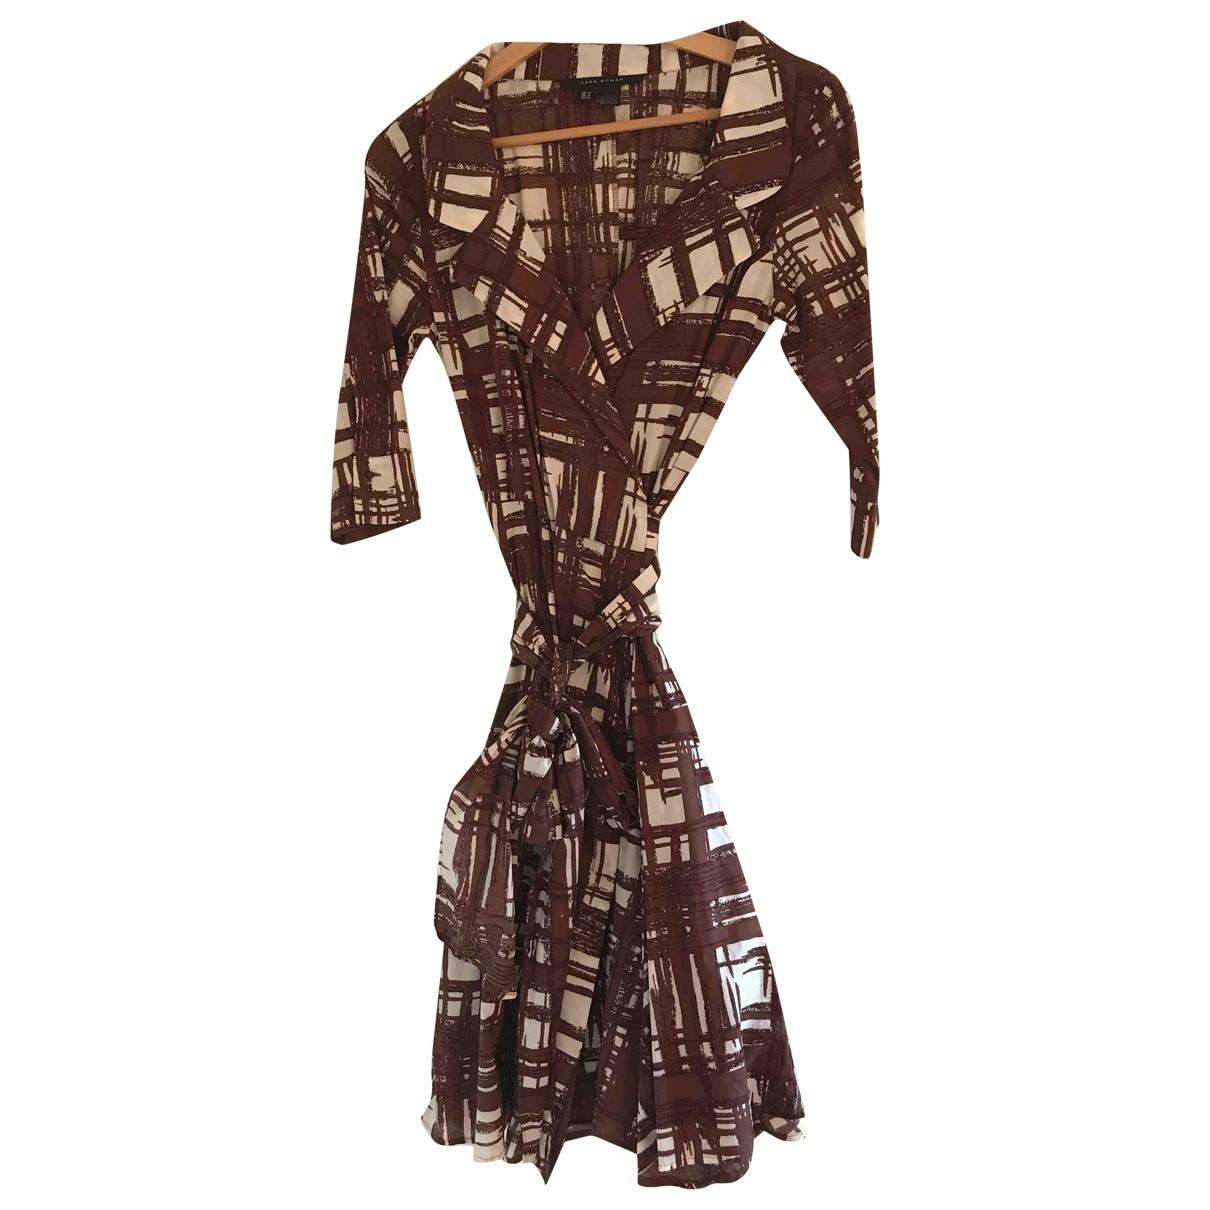 Zara \N Brown Cotton dress for Women M International